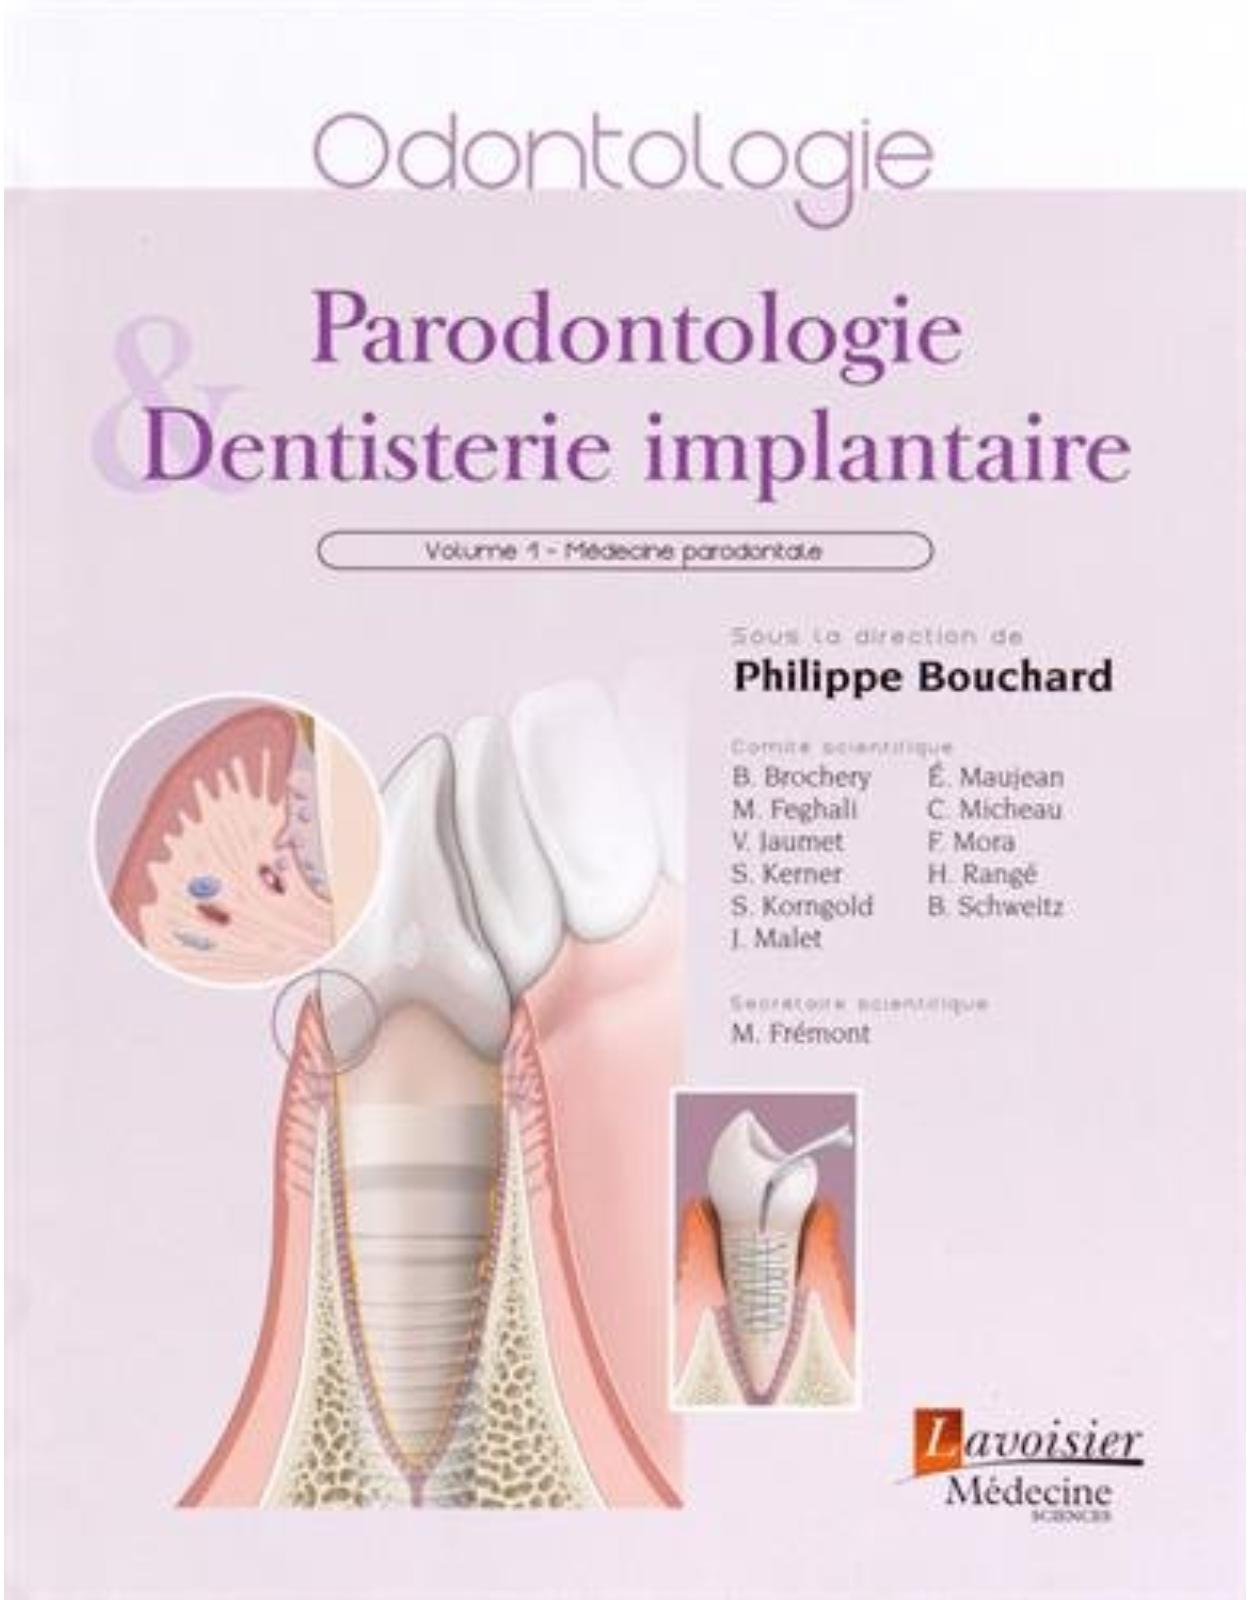 Parodontologie & dentisterie implantaire : Volume 1, Medicine parodontale